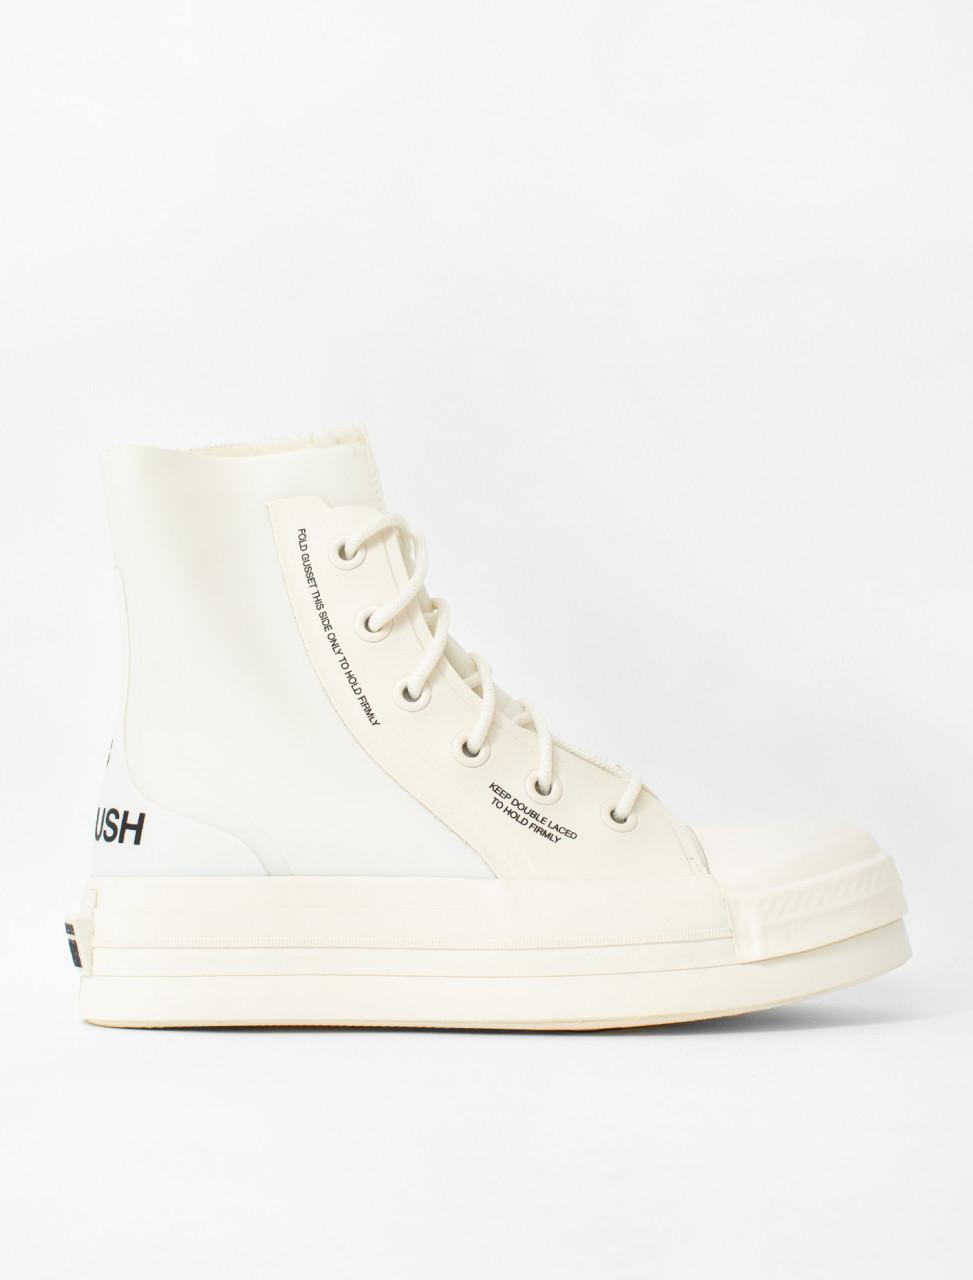 x Ambush Chuck 70 High Sneaker